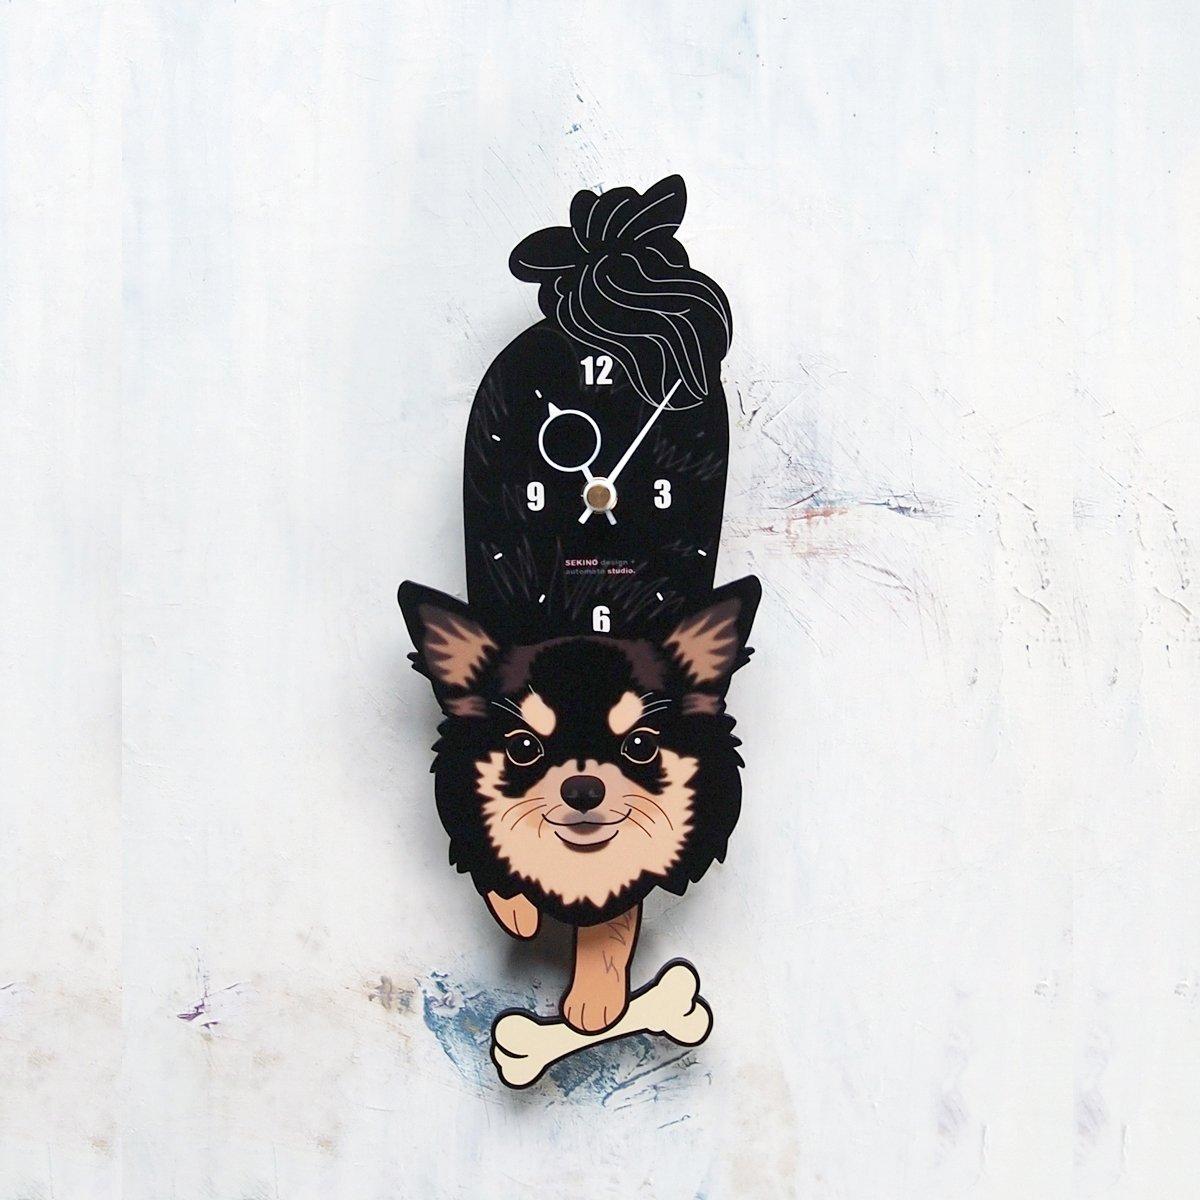 D-49 チワワ白黒(長毛)-犬の振り子時計 B0146ETAYC